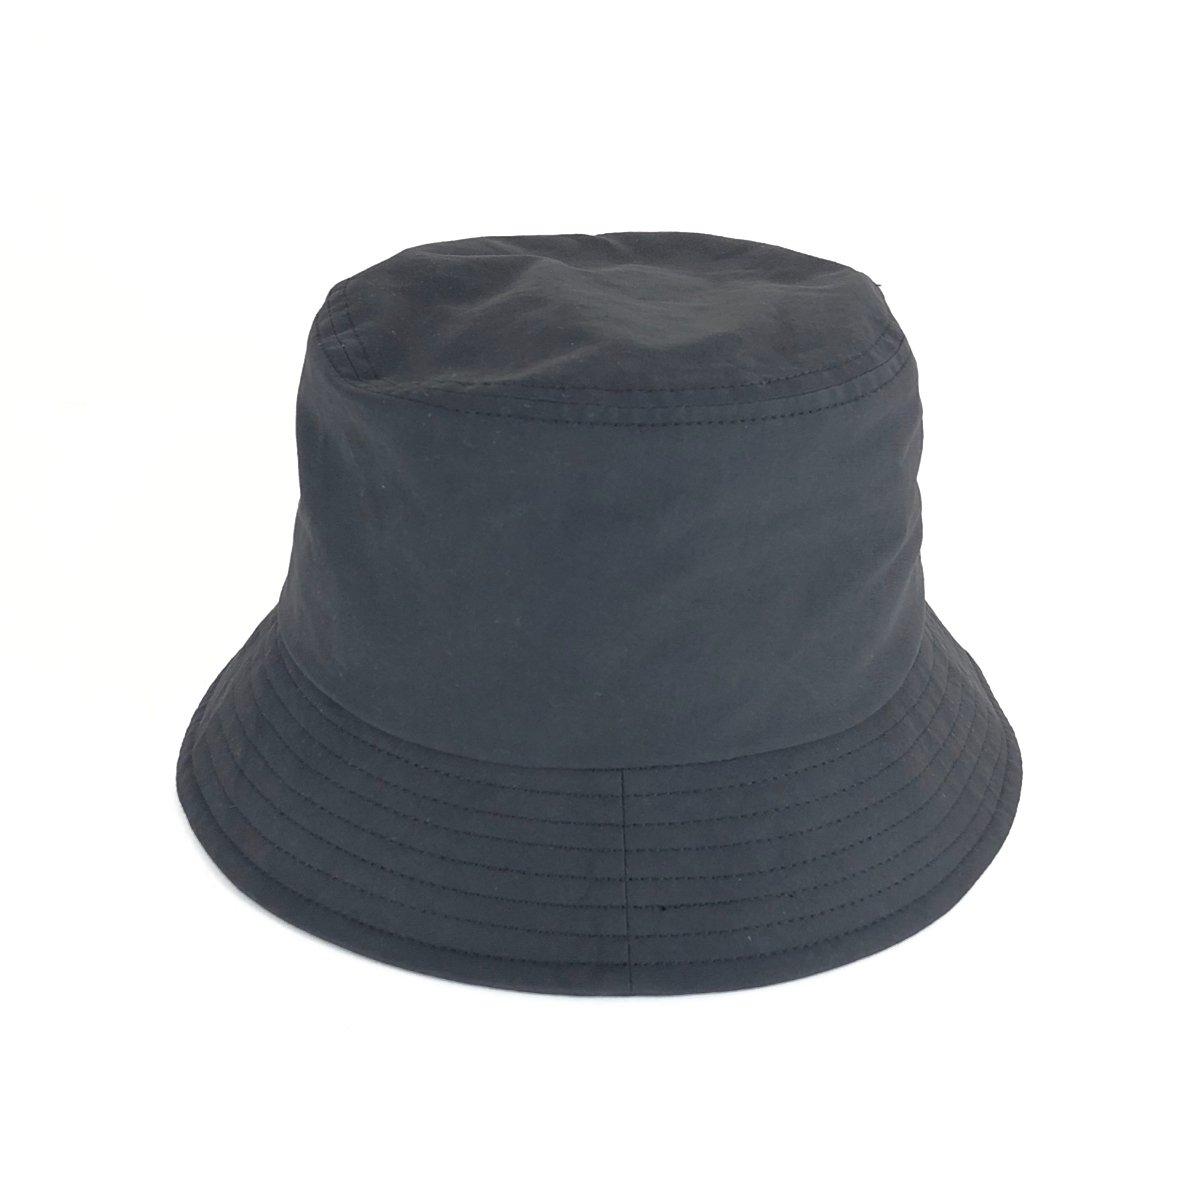 Genius BK Hat 詳細画像4